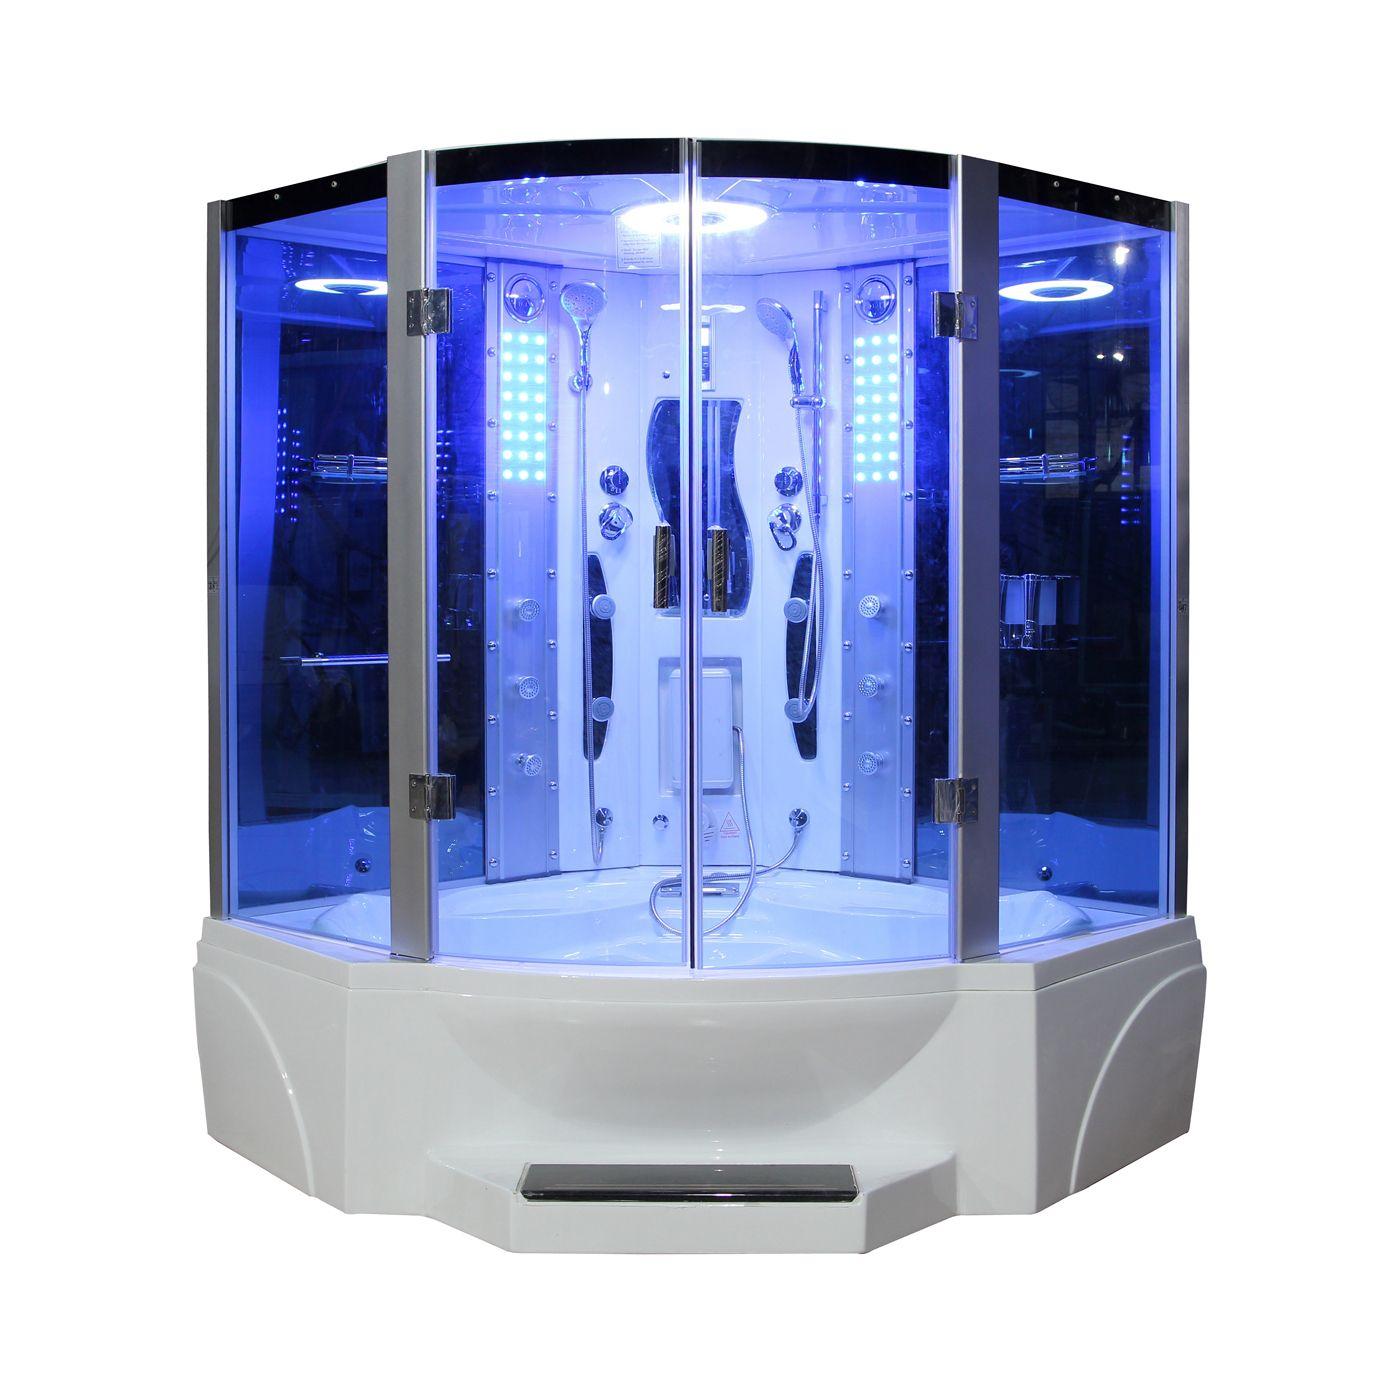 Walk In Tub Shower Combo Canada Full Image For Walk In Bathtub